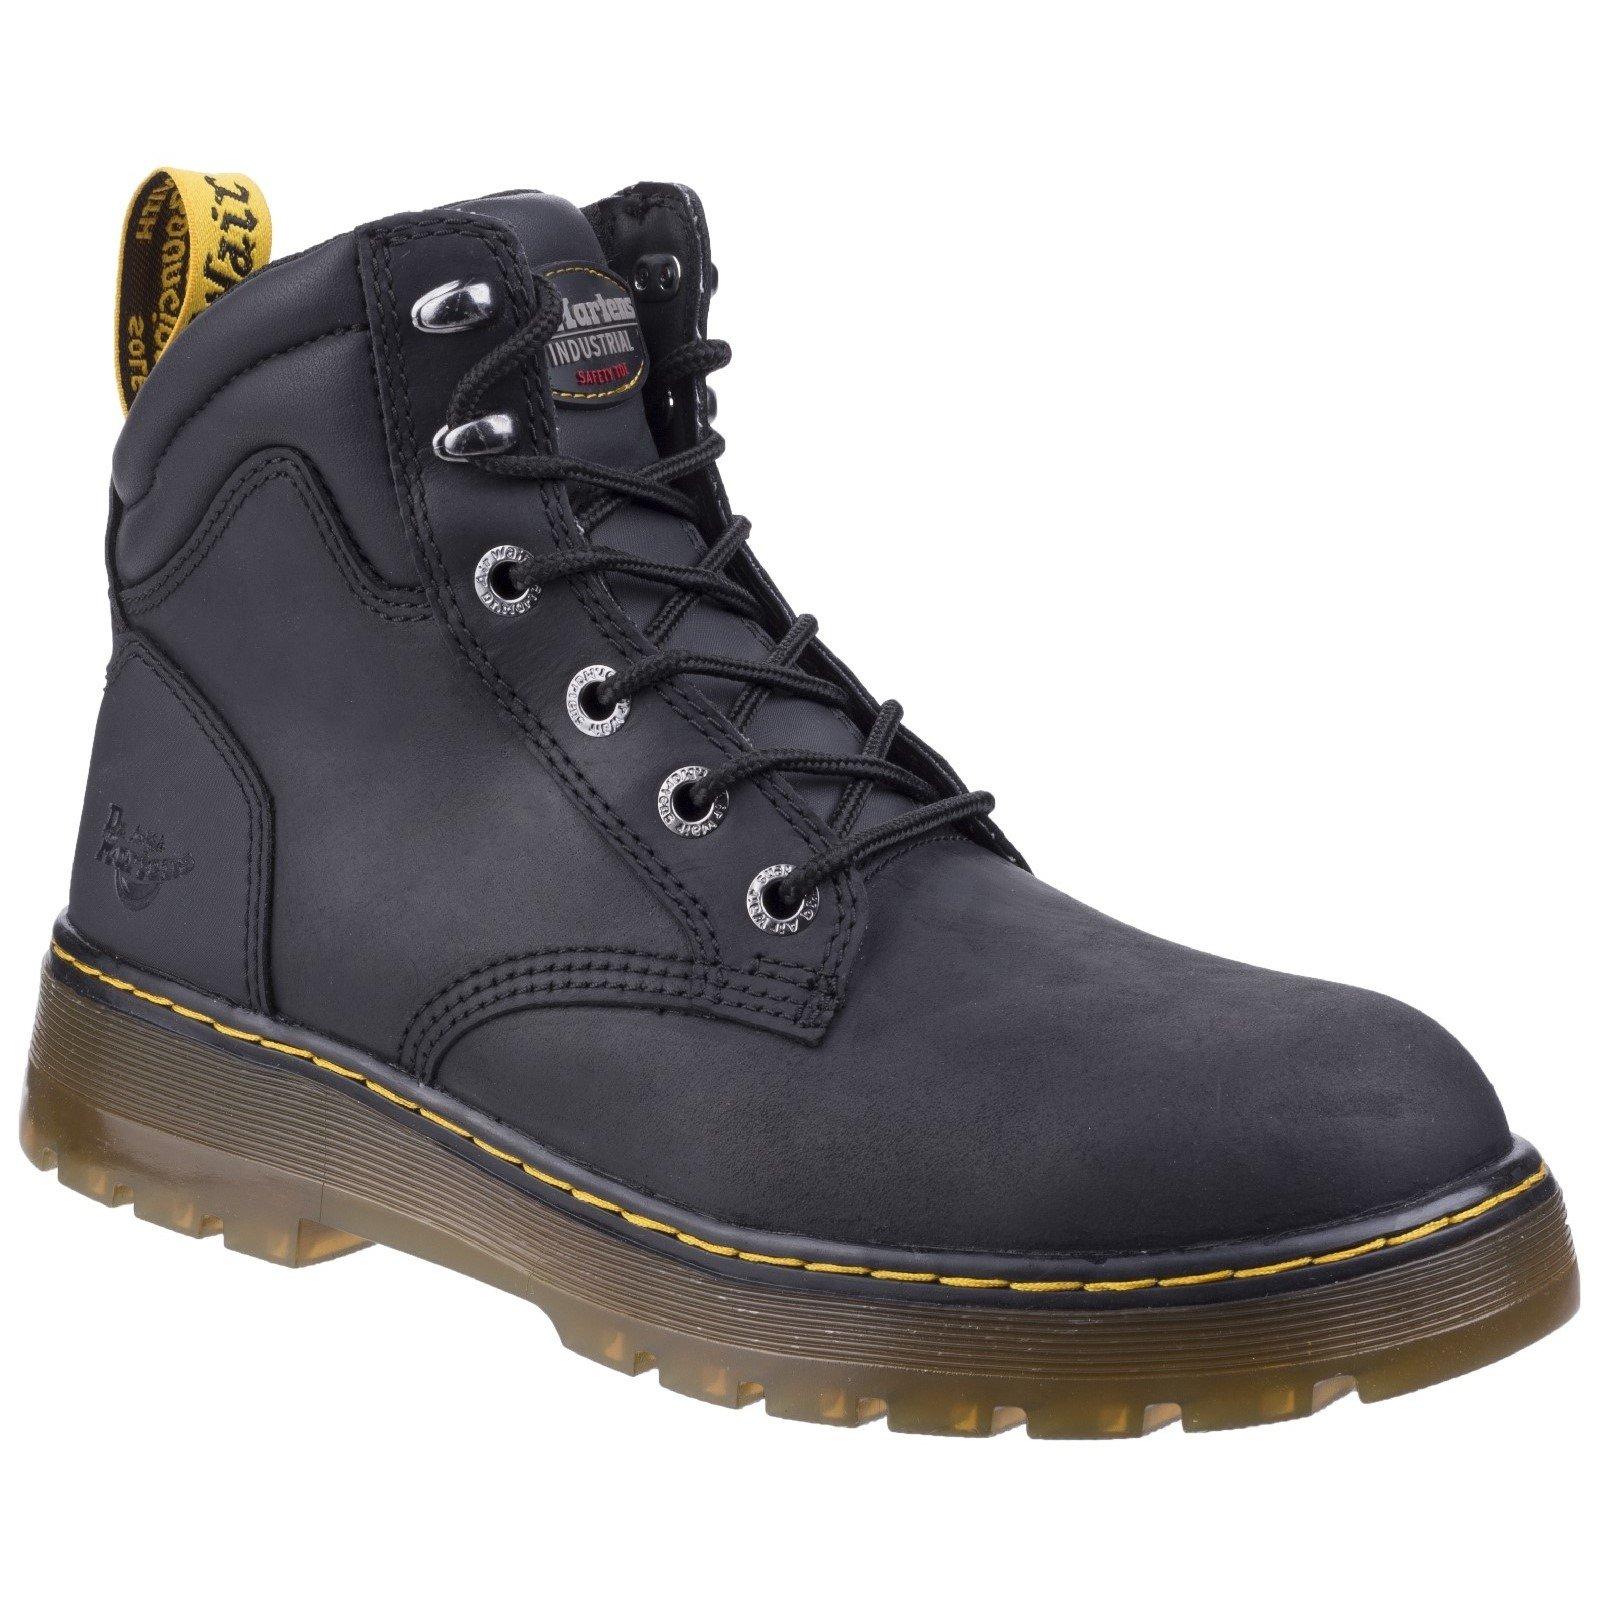 Dr Martens Unisex Brace Hiking Style Safety Boot Various Colours 27702-46606 - Black Republic 3